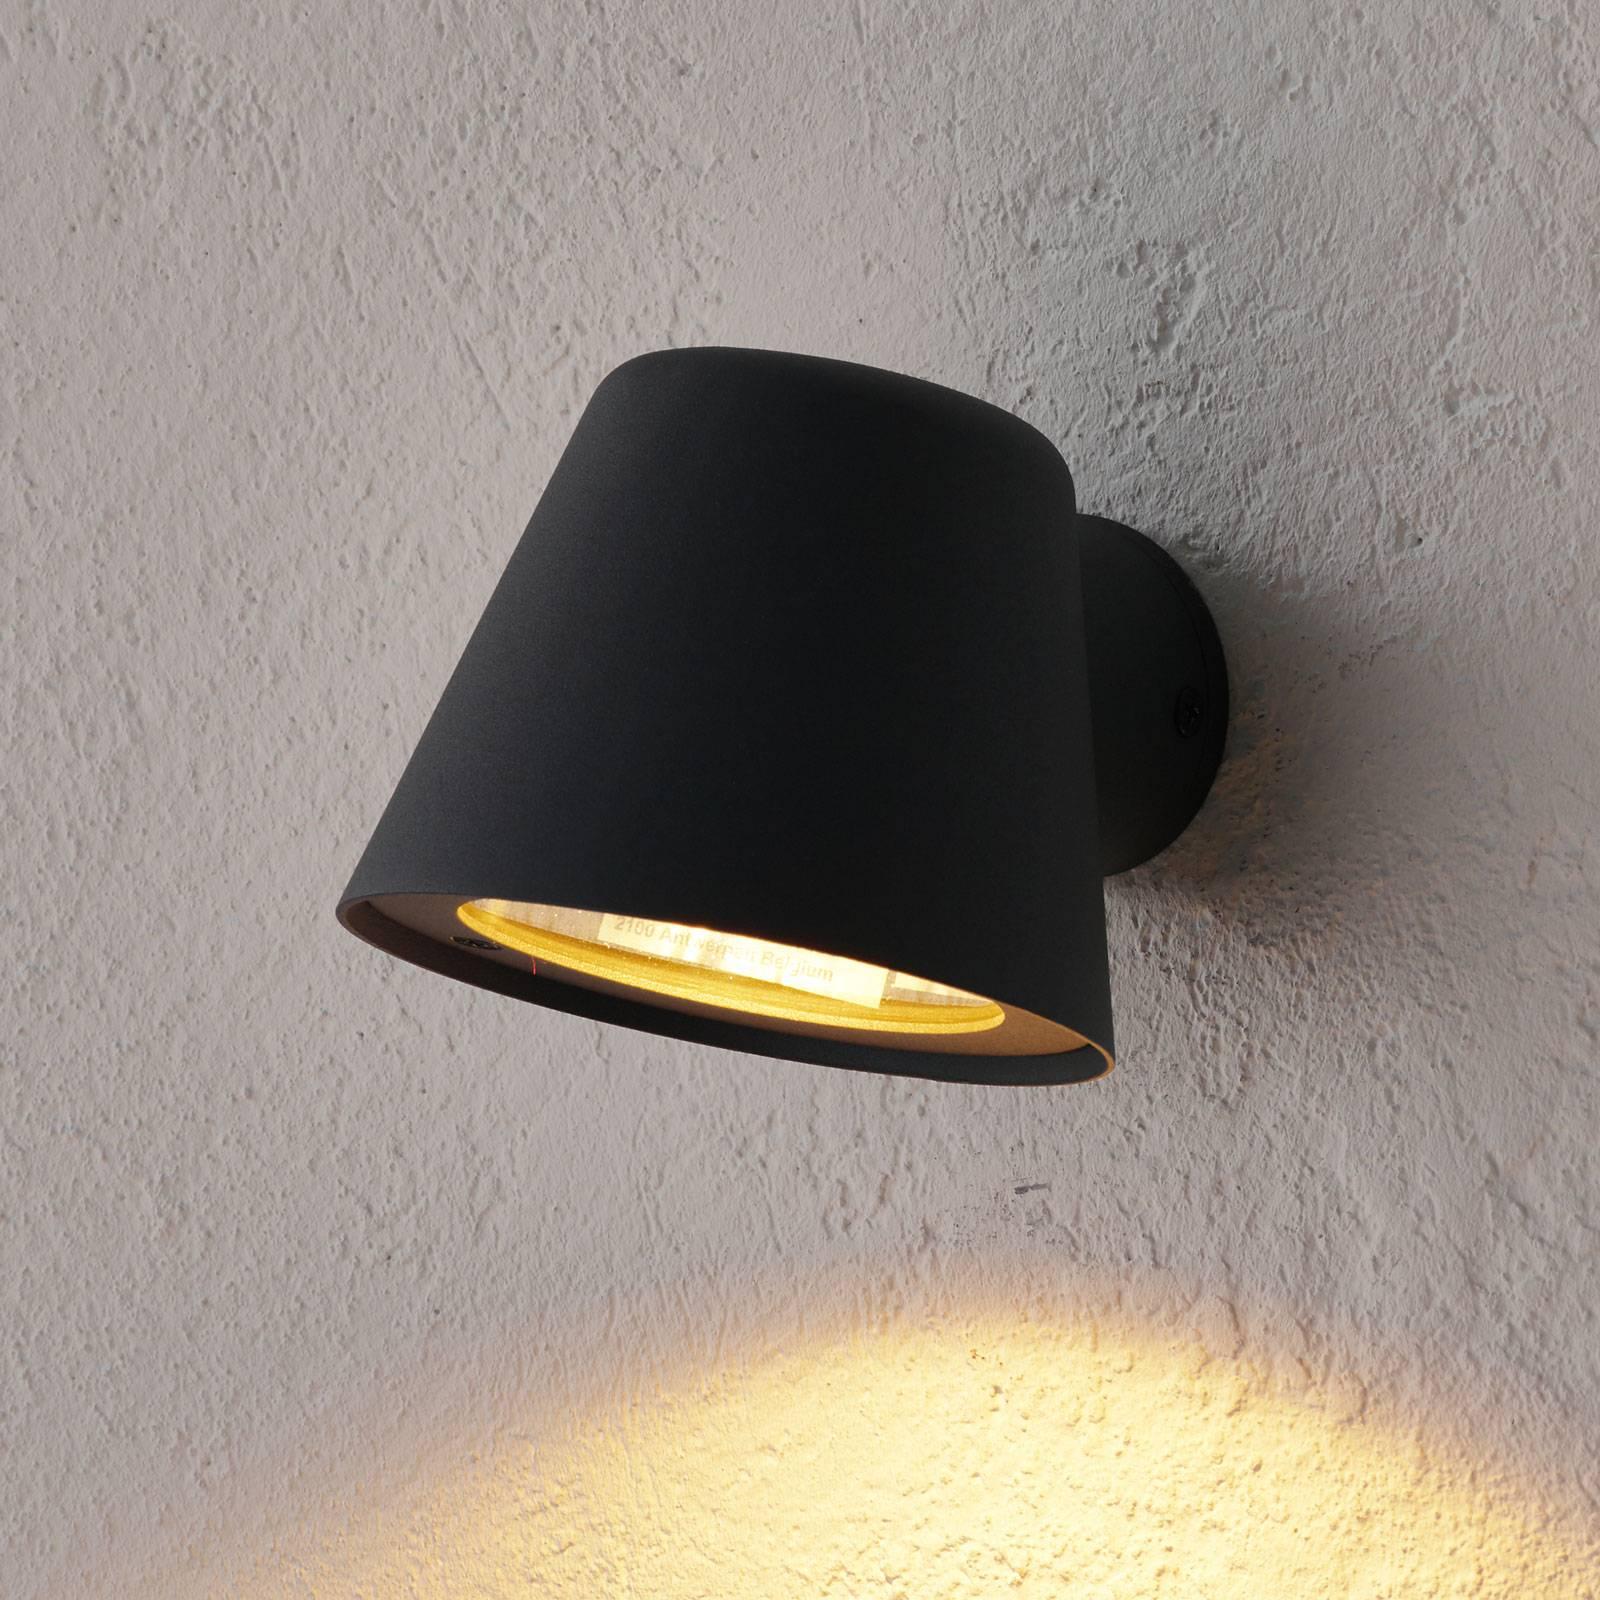 Anthrazitfarbene LED-Außenwandleuchte Dingo, GU10